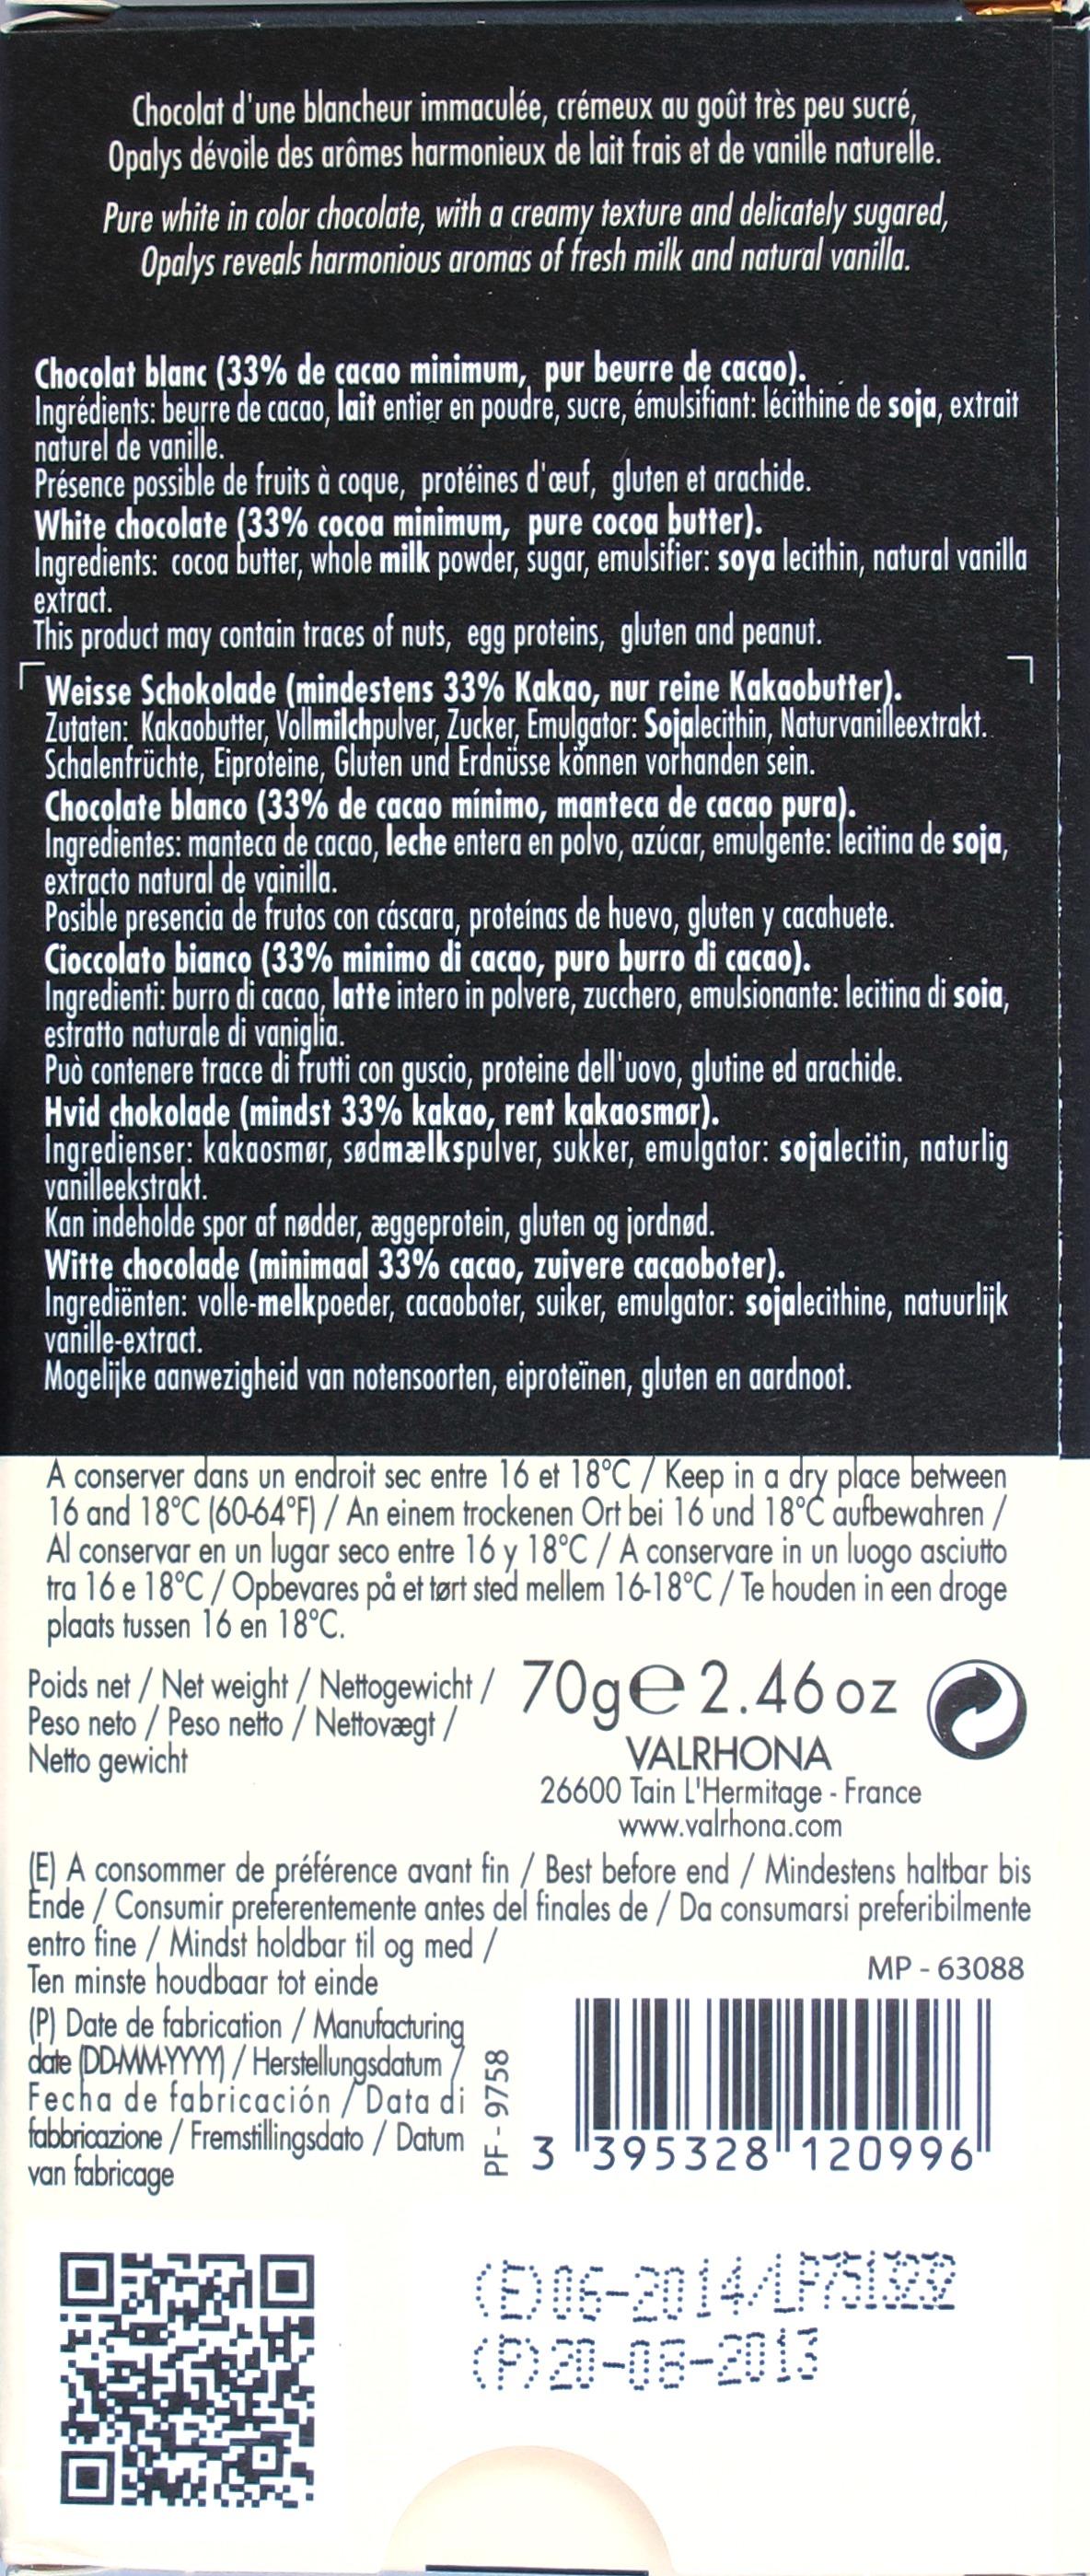 Valrhona Weiße Schokolade Opalys, Rückseite